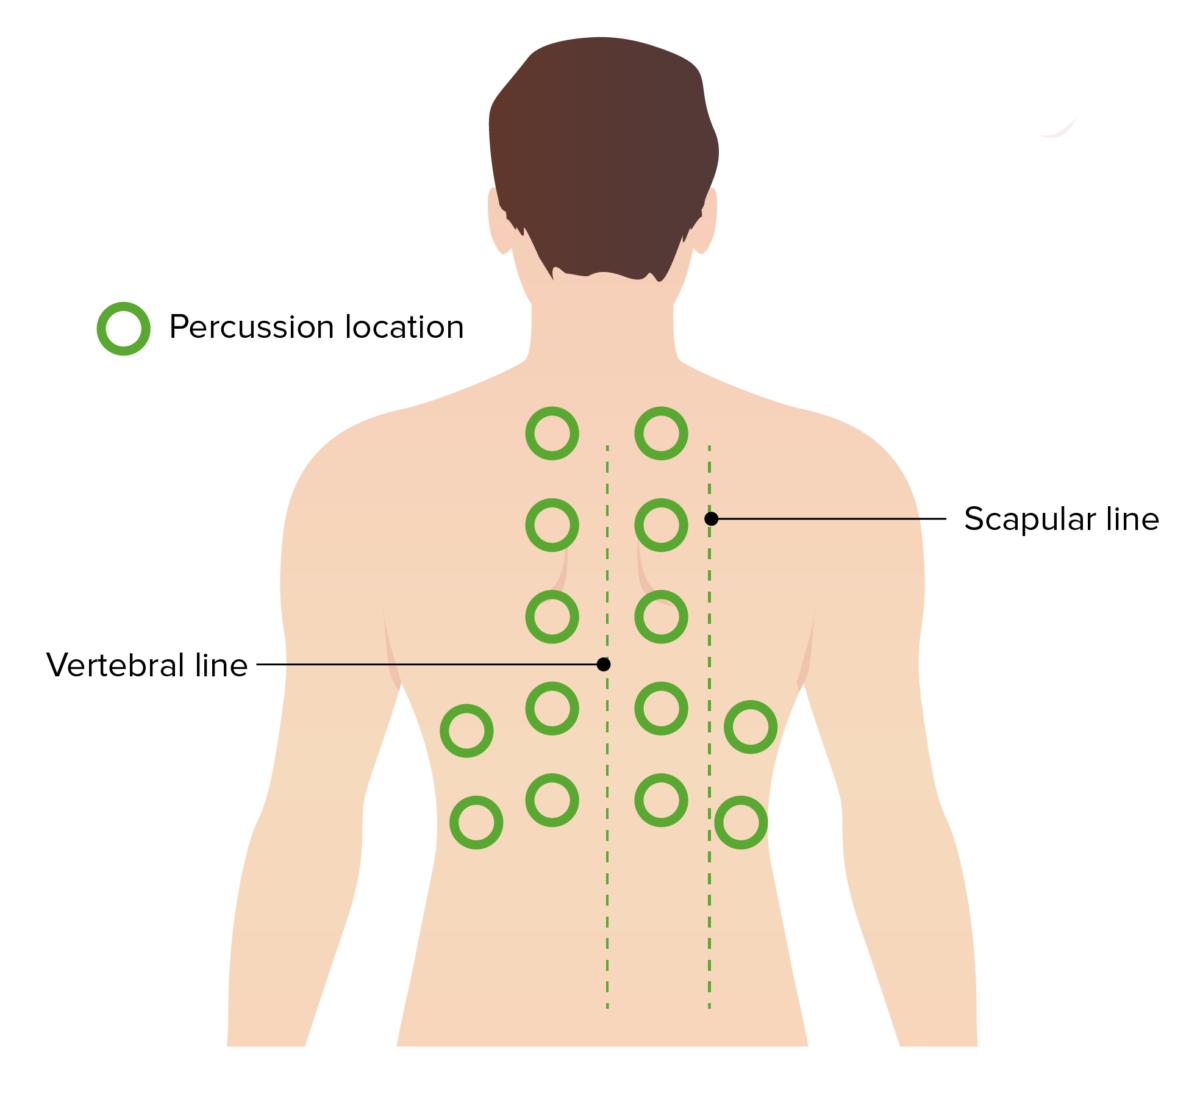 Pulmonary Exam - Percussion